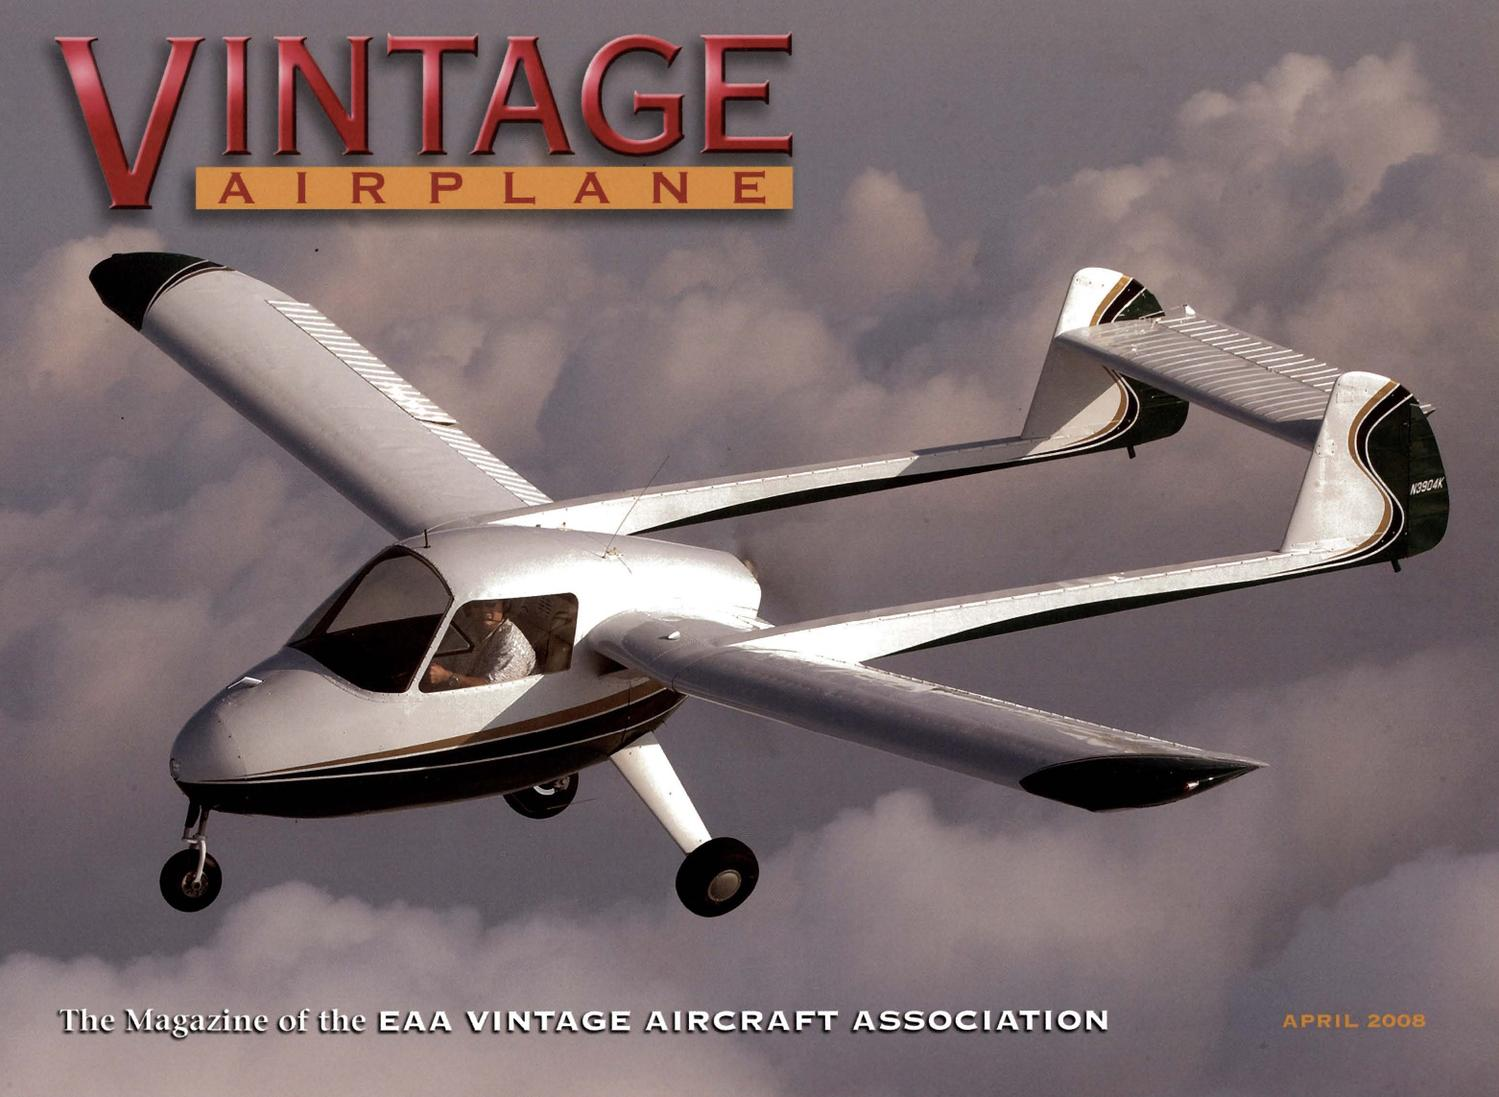 Va Vol 36 No 4 April 2008 By Eaa Vintage Aircraft Association Issuu 74147 Datasheet